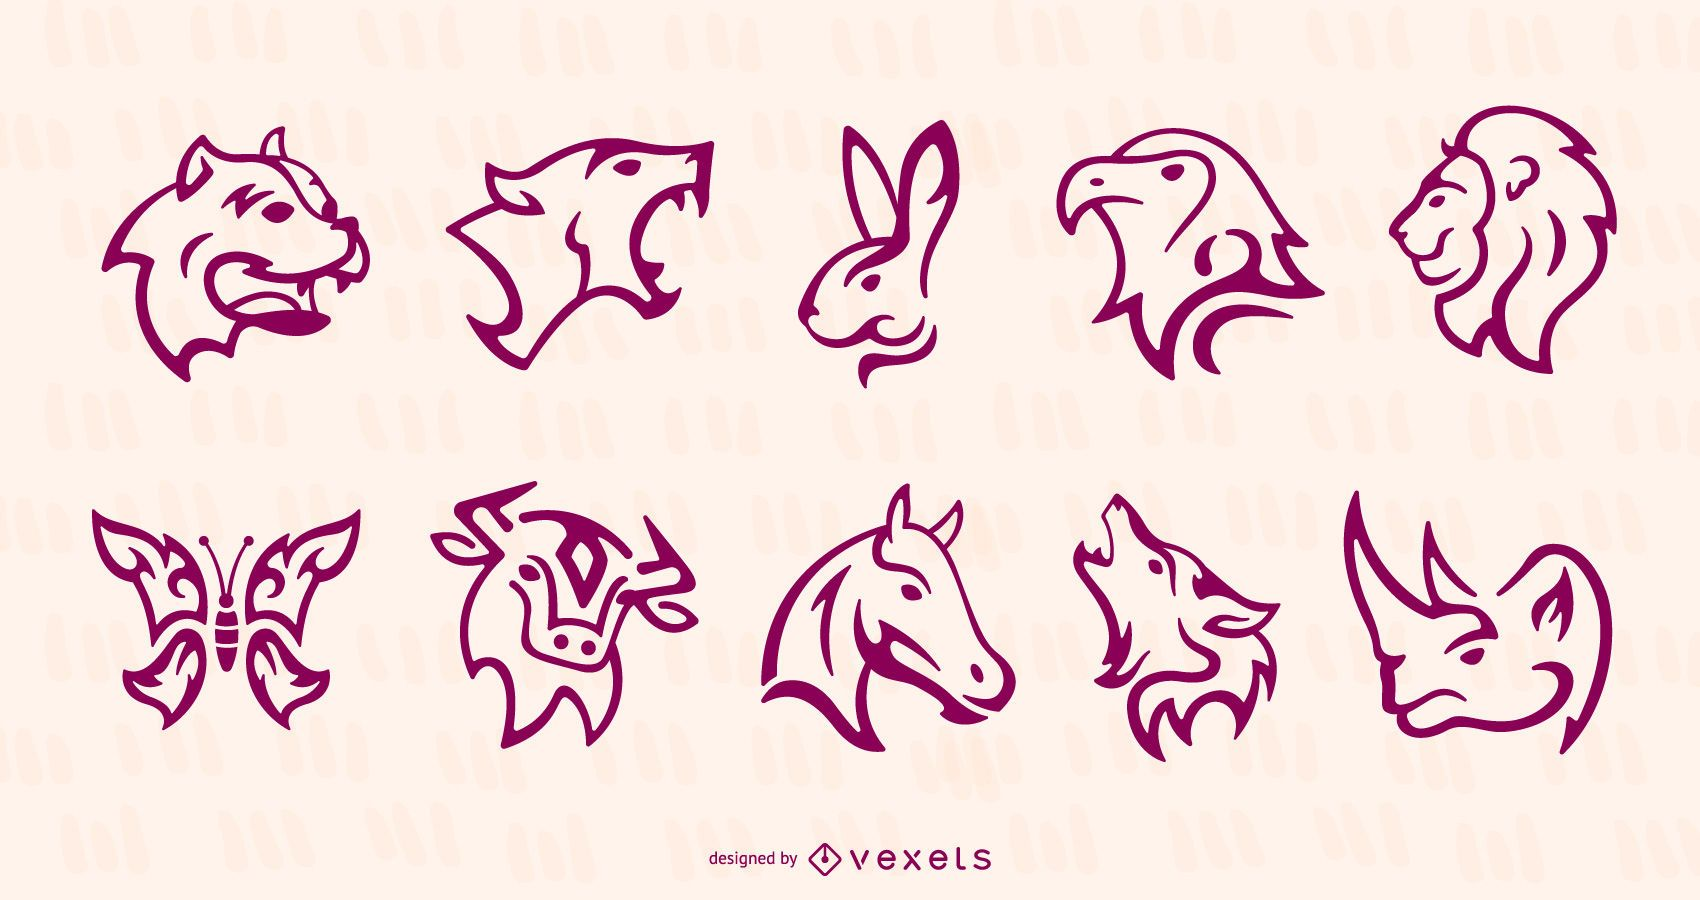 Stroke animals tattoo set